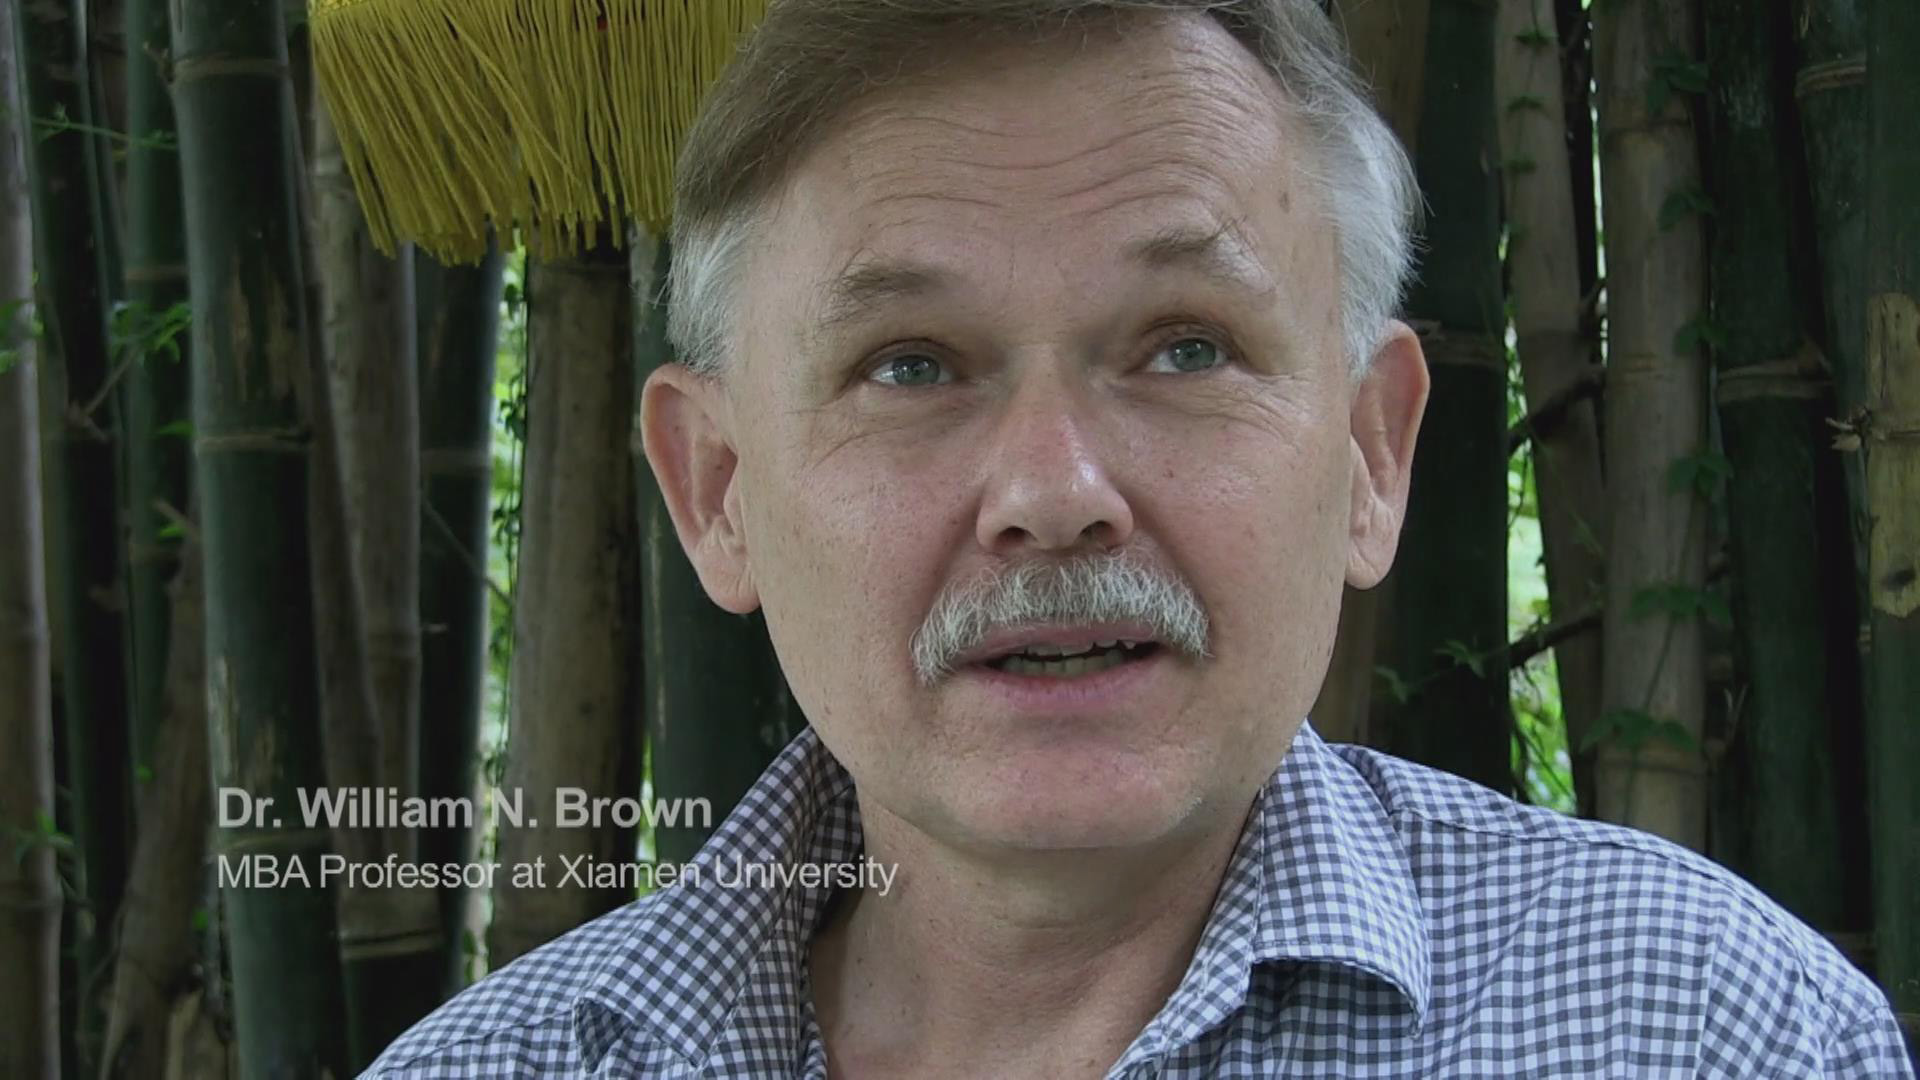 Dr William N Brown, MBA Professor at Xiamen University